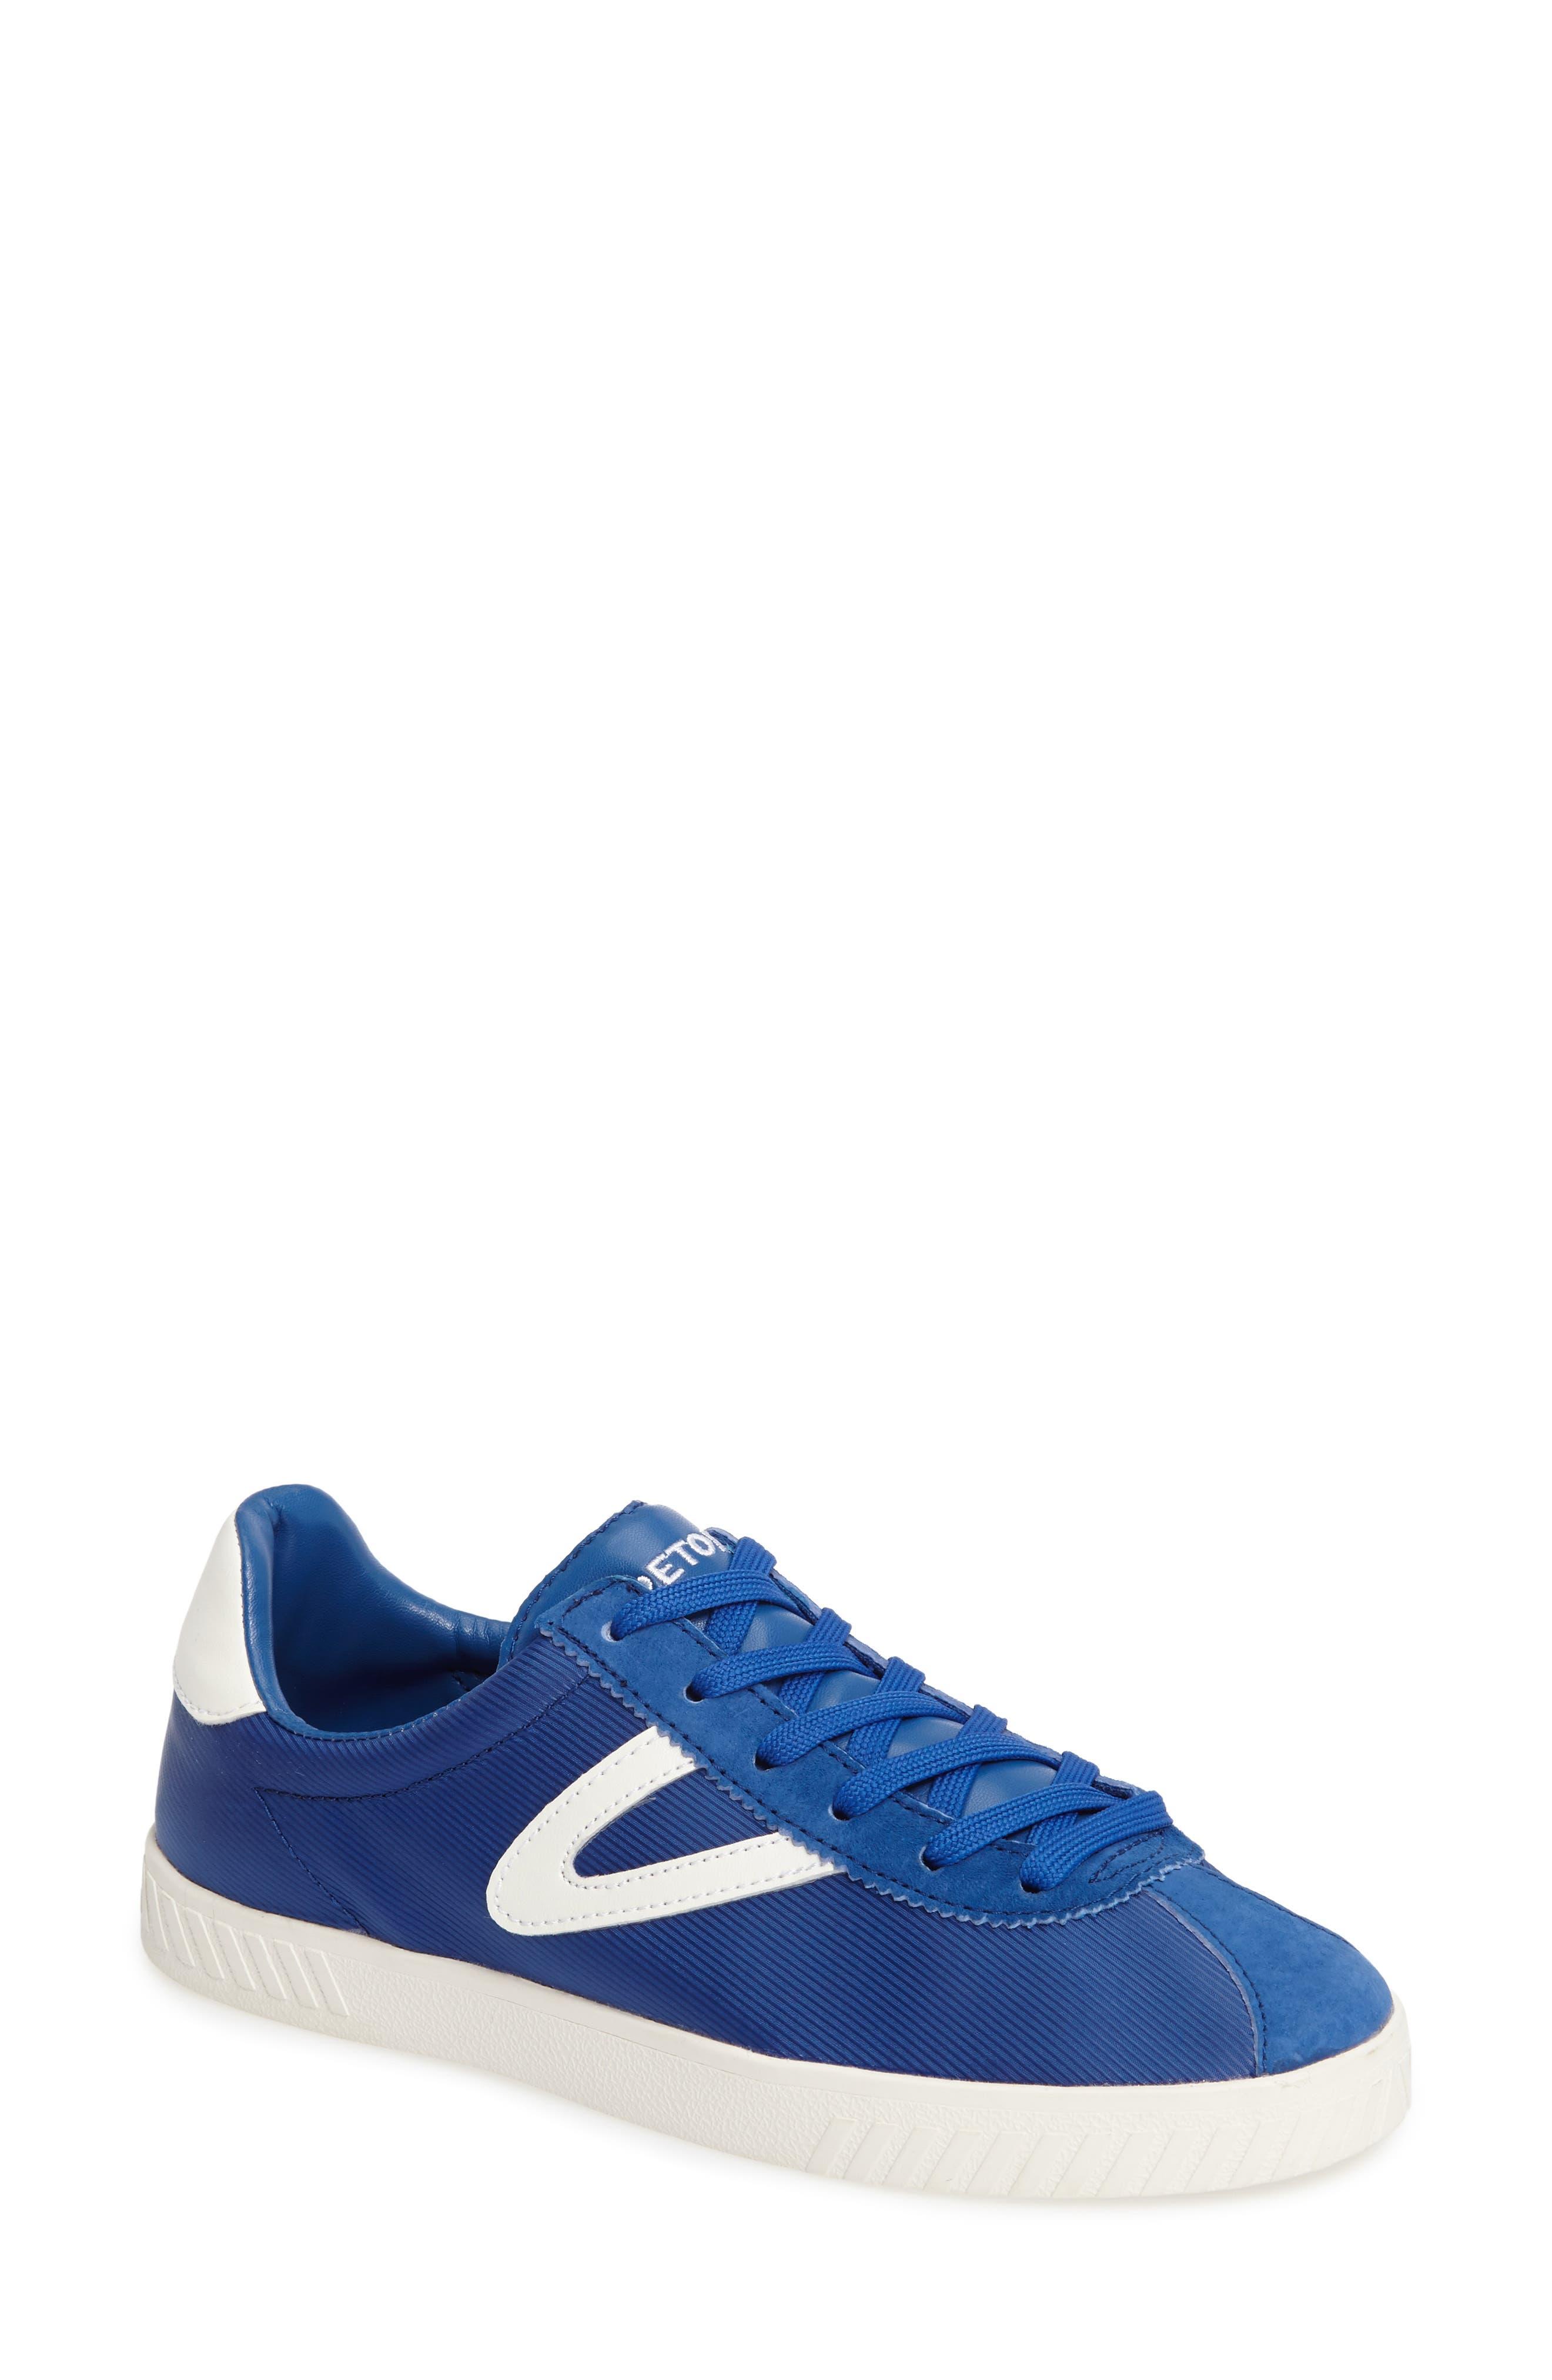 TRETORN Camden4 Sneaker